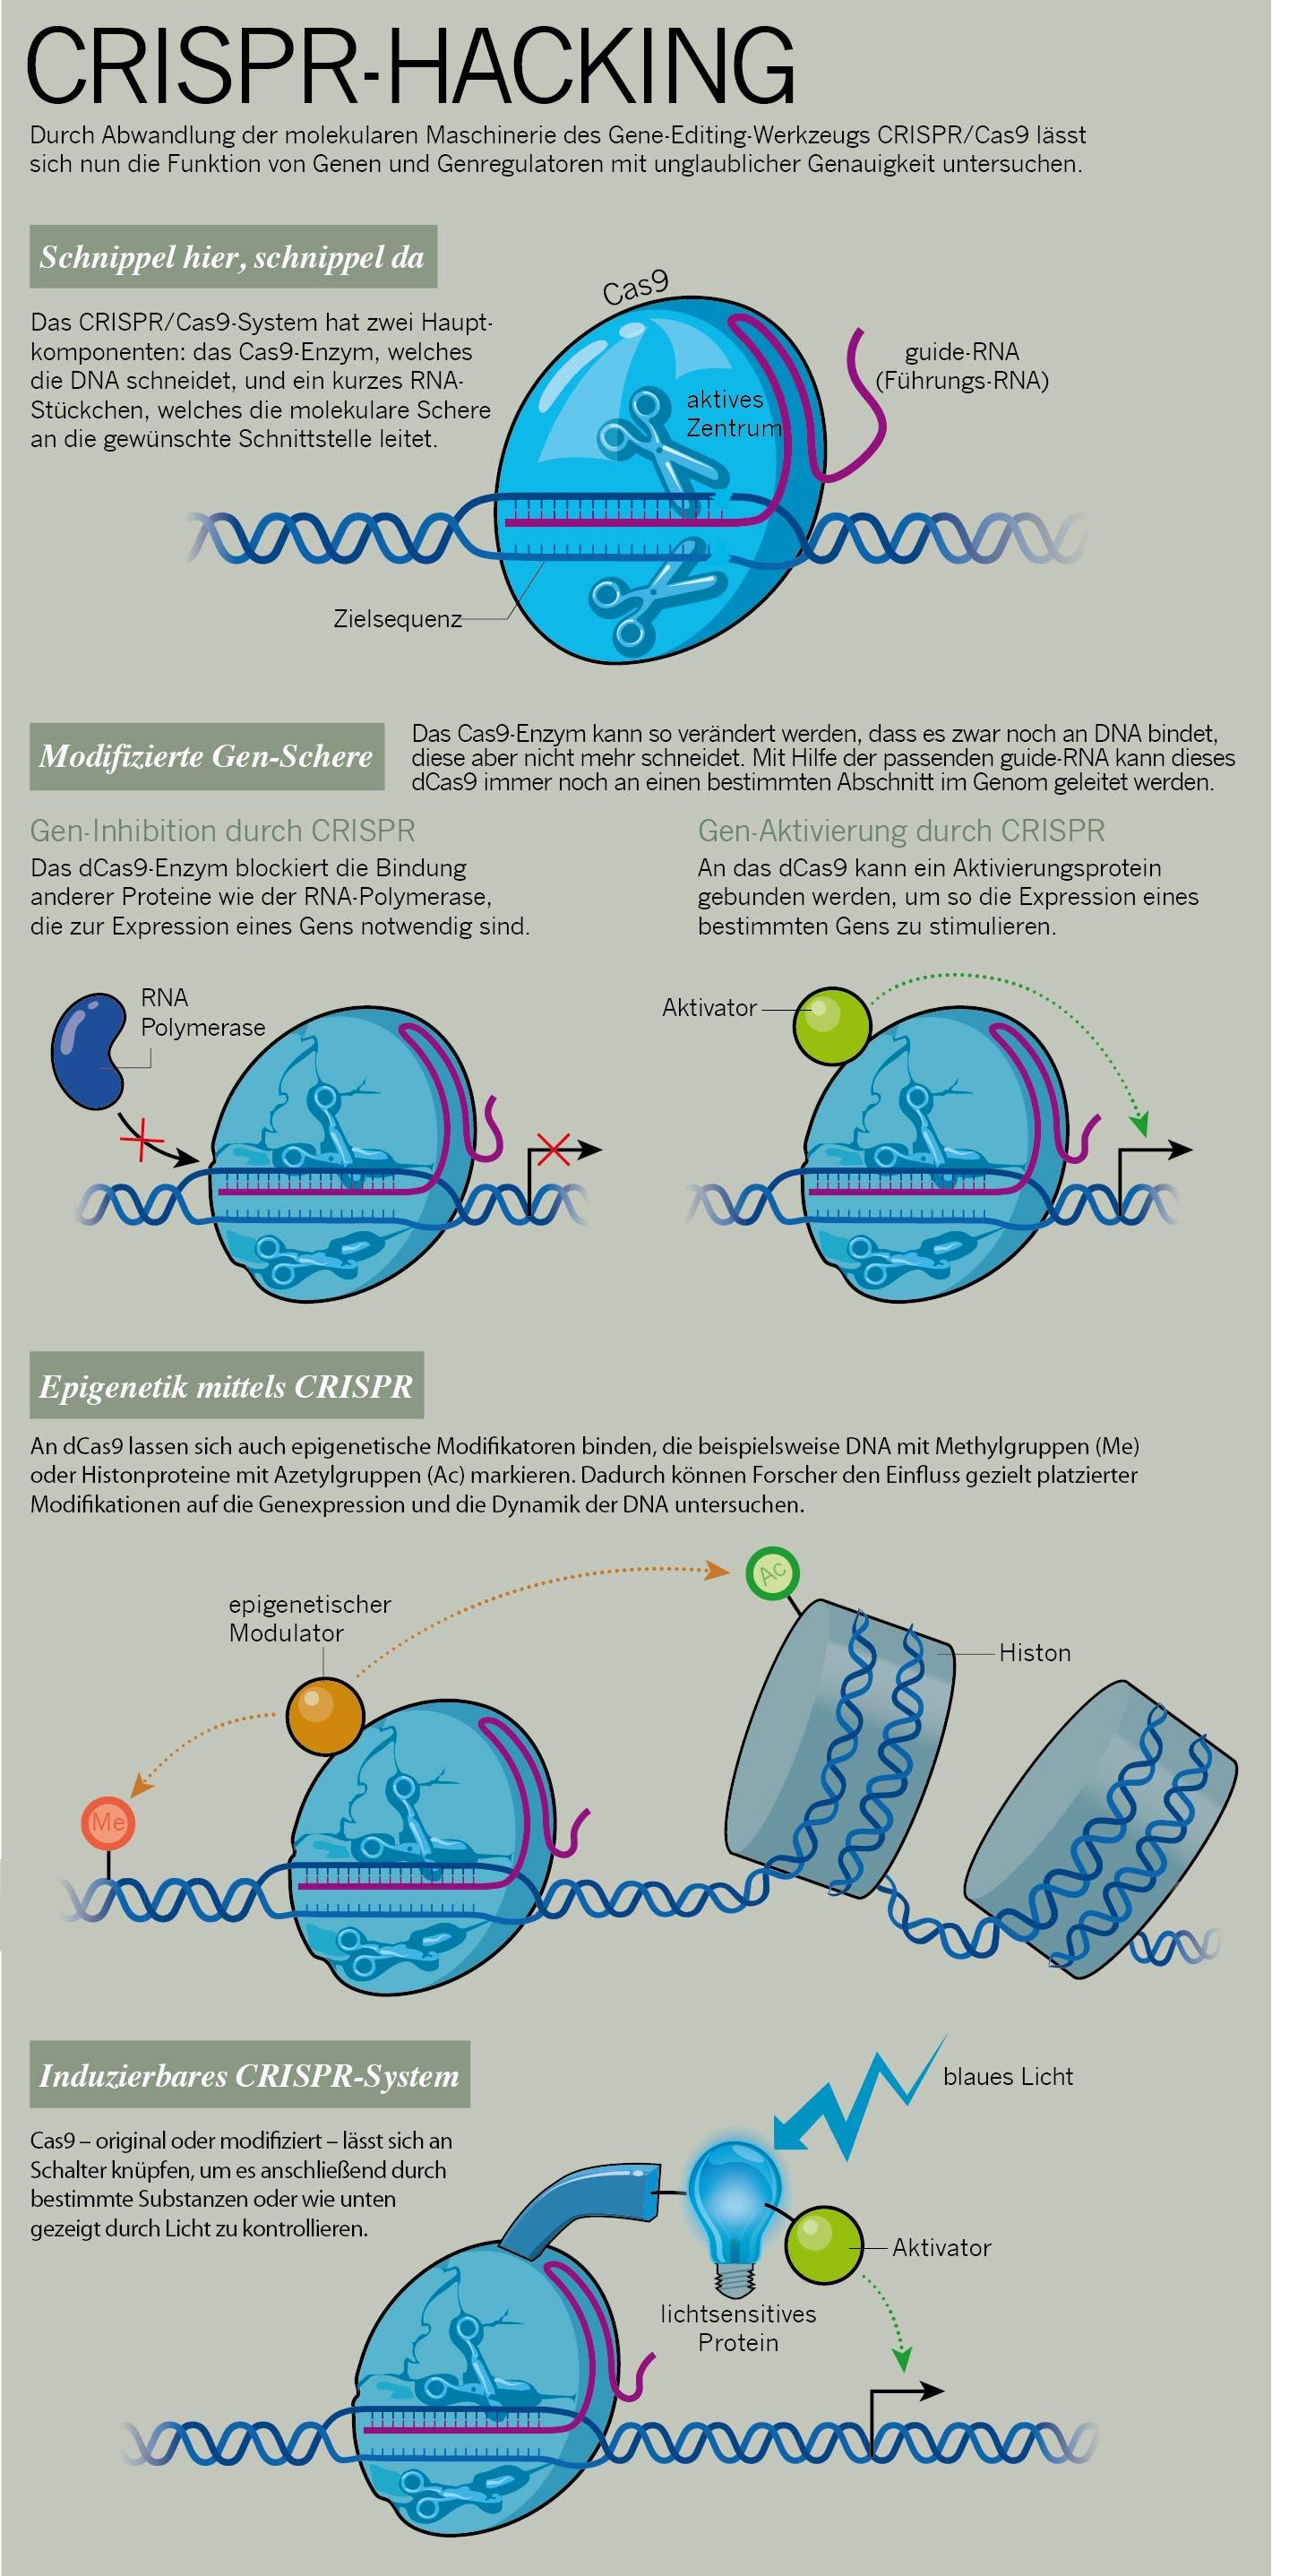 CRISPR-Hacking